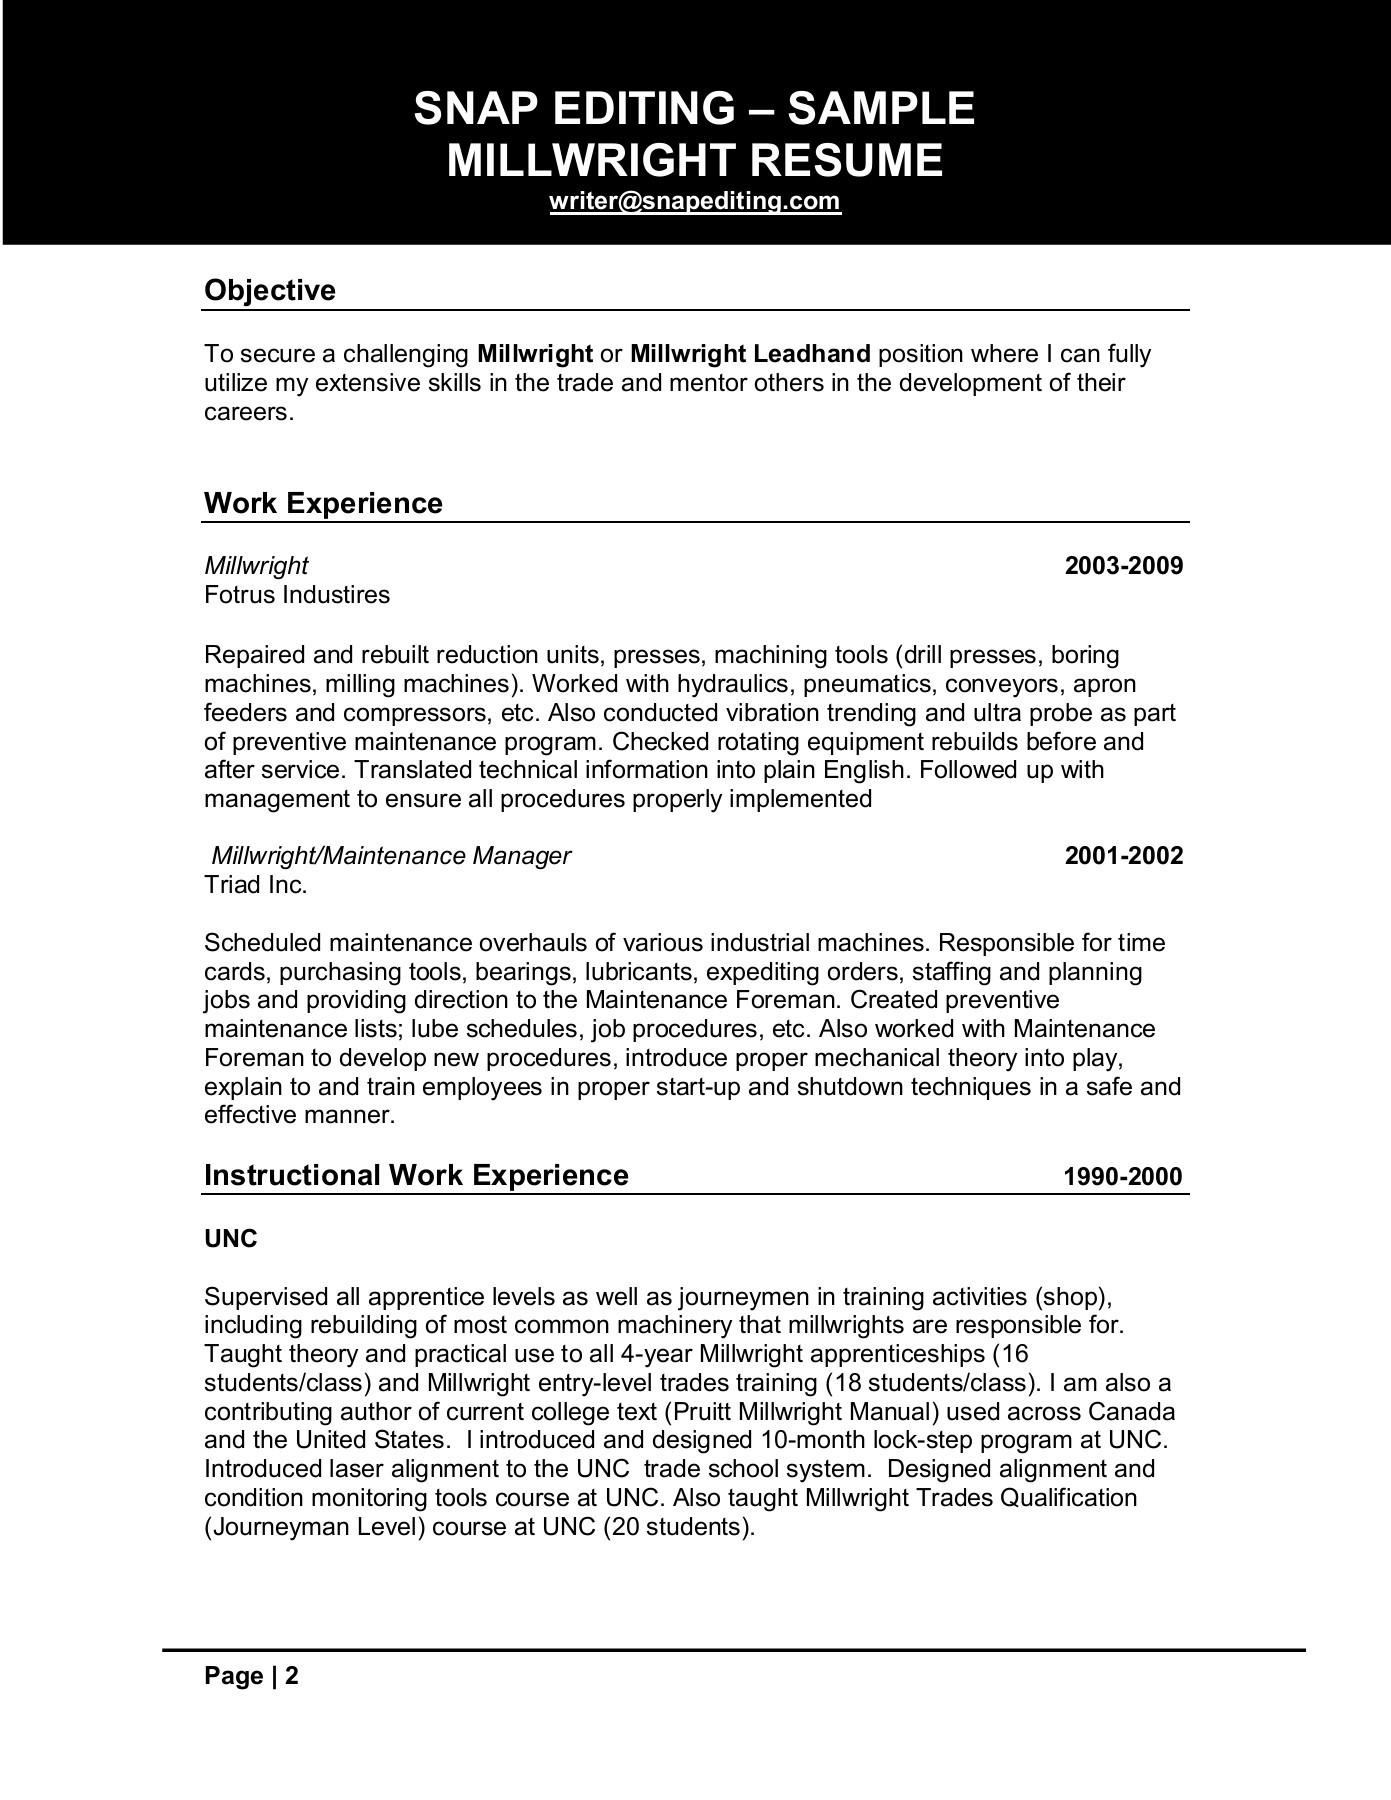 Skills Resume Free Millwright Hr Assistant Job Sample